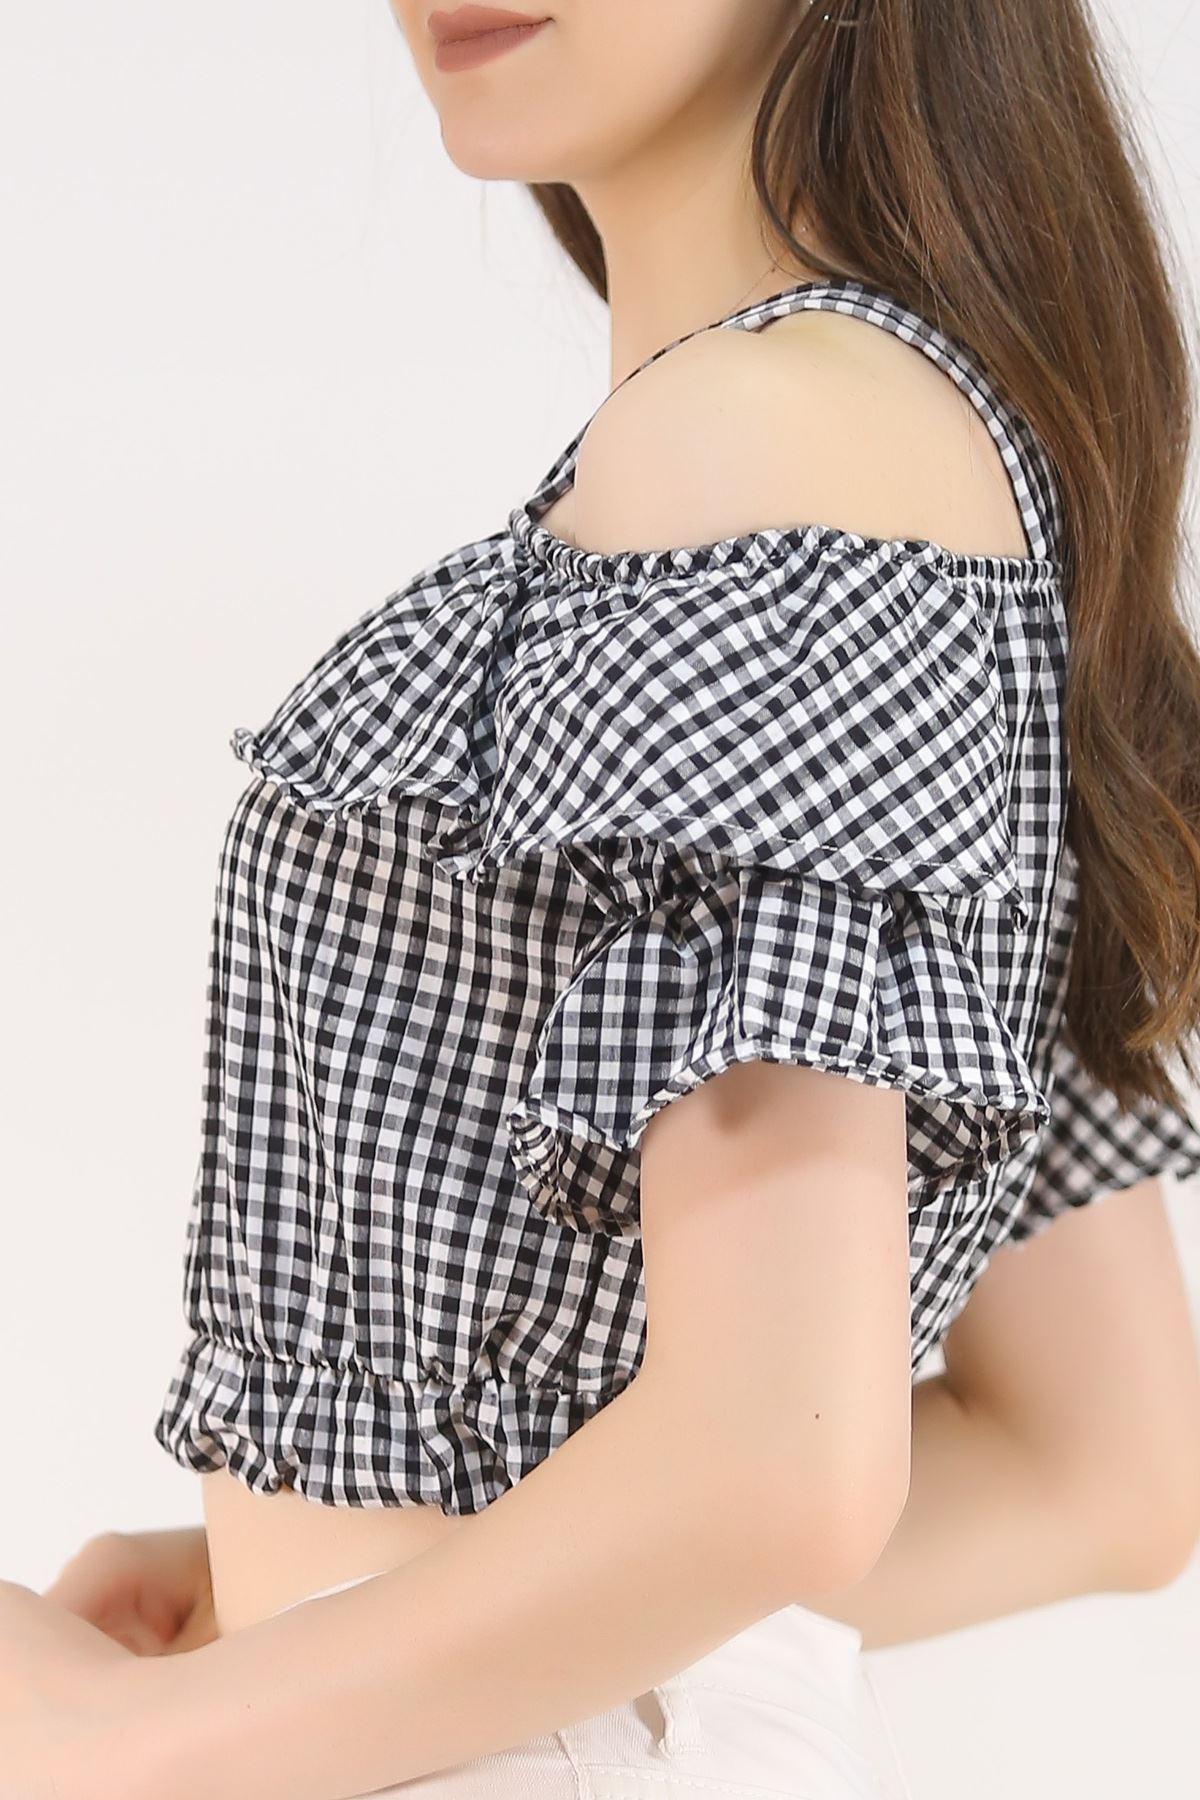 Askılı Crop Bluz Siyah - 4718.148.